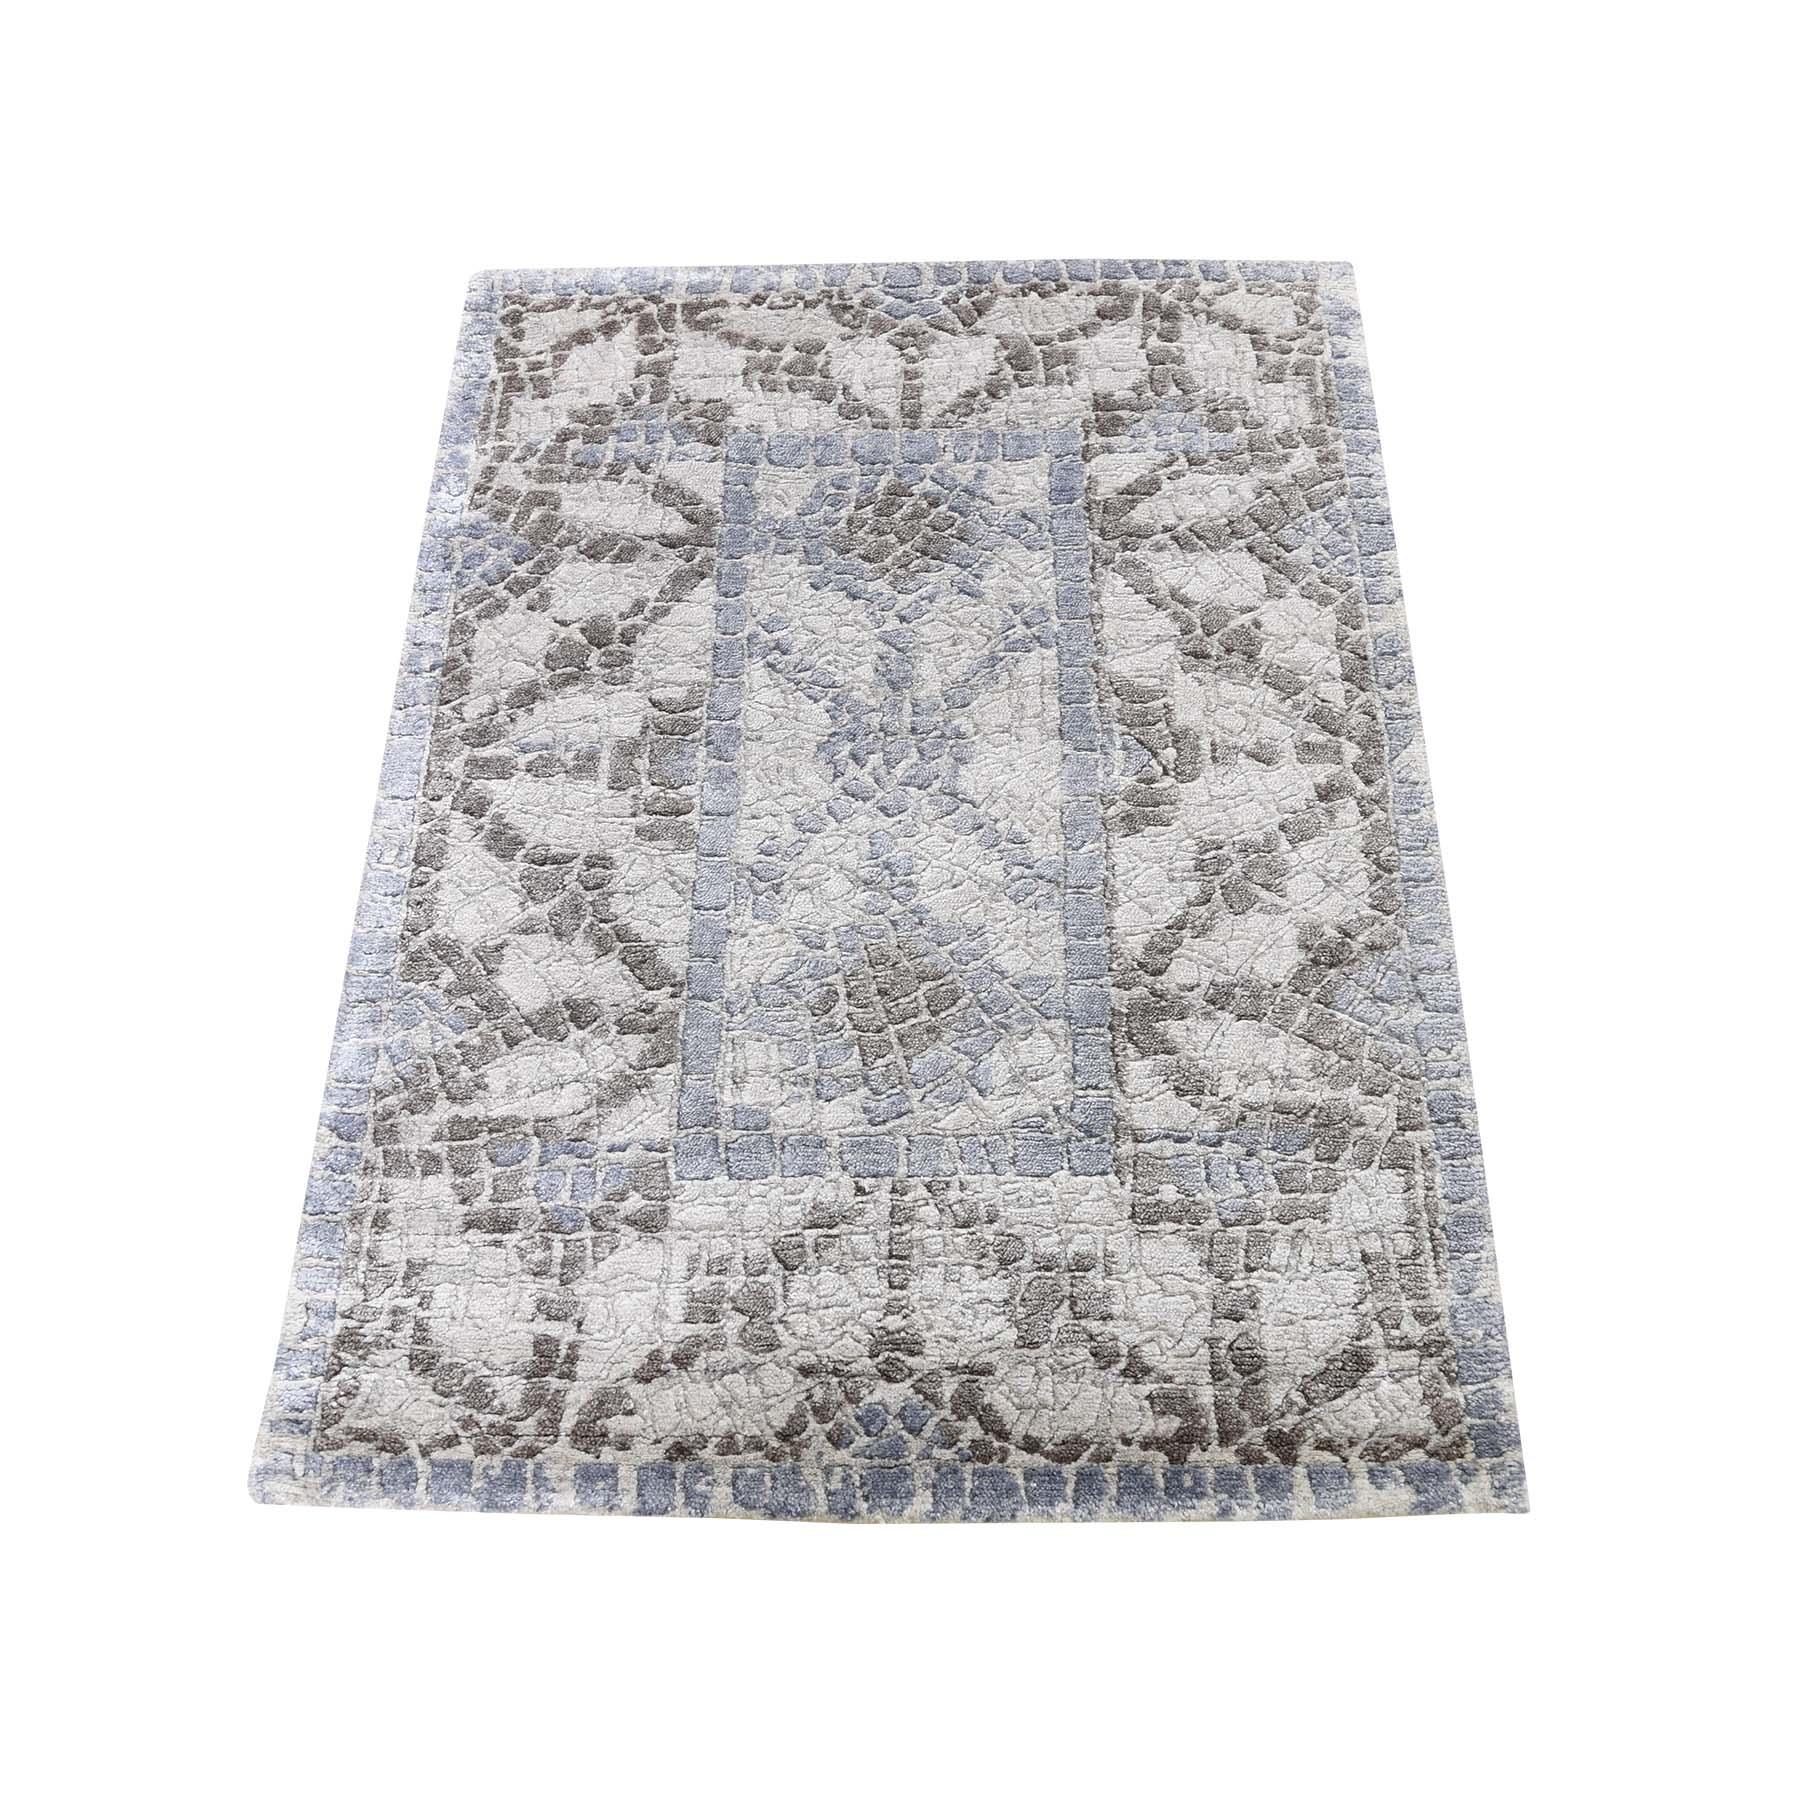 "2'2""x3'1"" Silver,Blue Silken Roman Mosaic Design Hand-Knotted Oriental Rug"